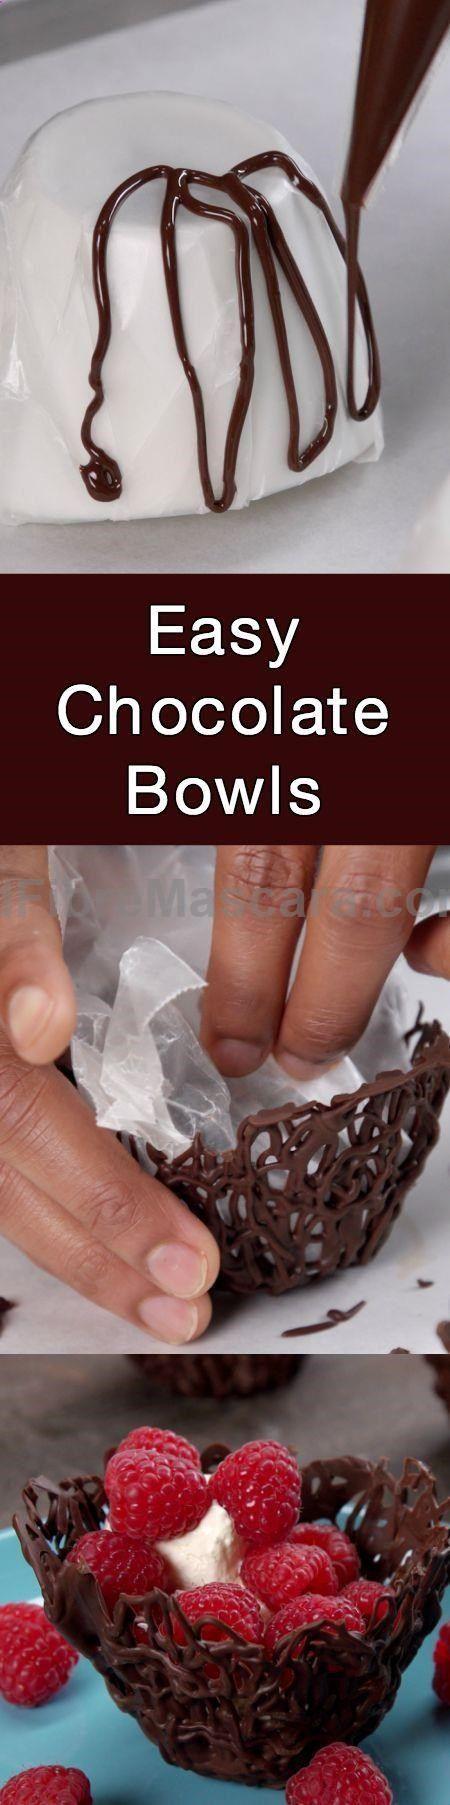 Beautiful! Finally!! A way to create chocolate bowls that I can do with my latex allergy...no balloons involved! #latex #sexy #ladies #women #latexskirt #latexdominate #latexboss #shiny #fashion #latexshopping #buylatex #skirts